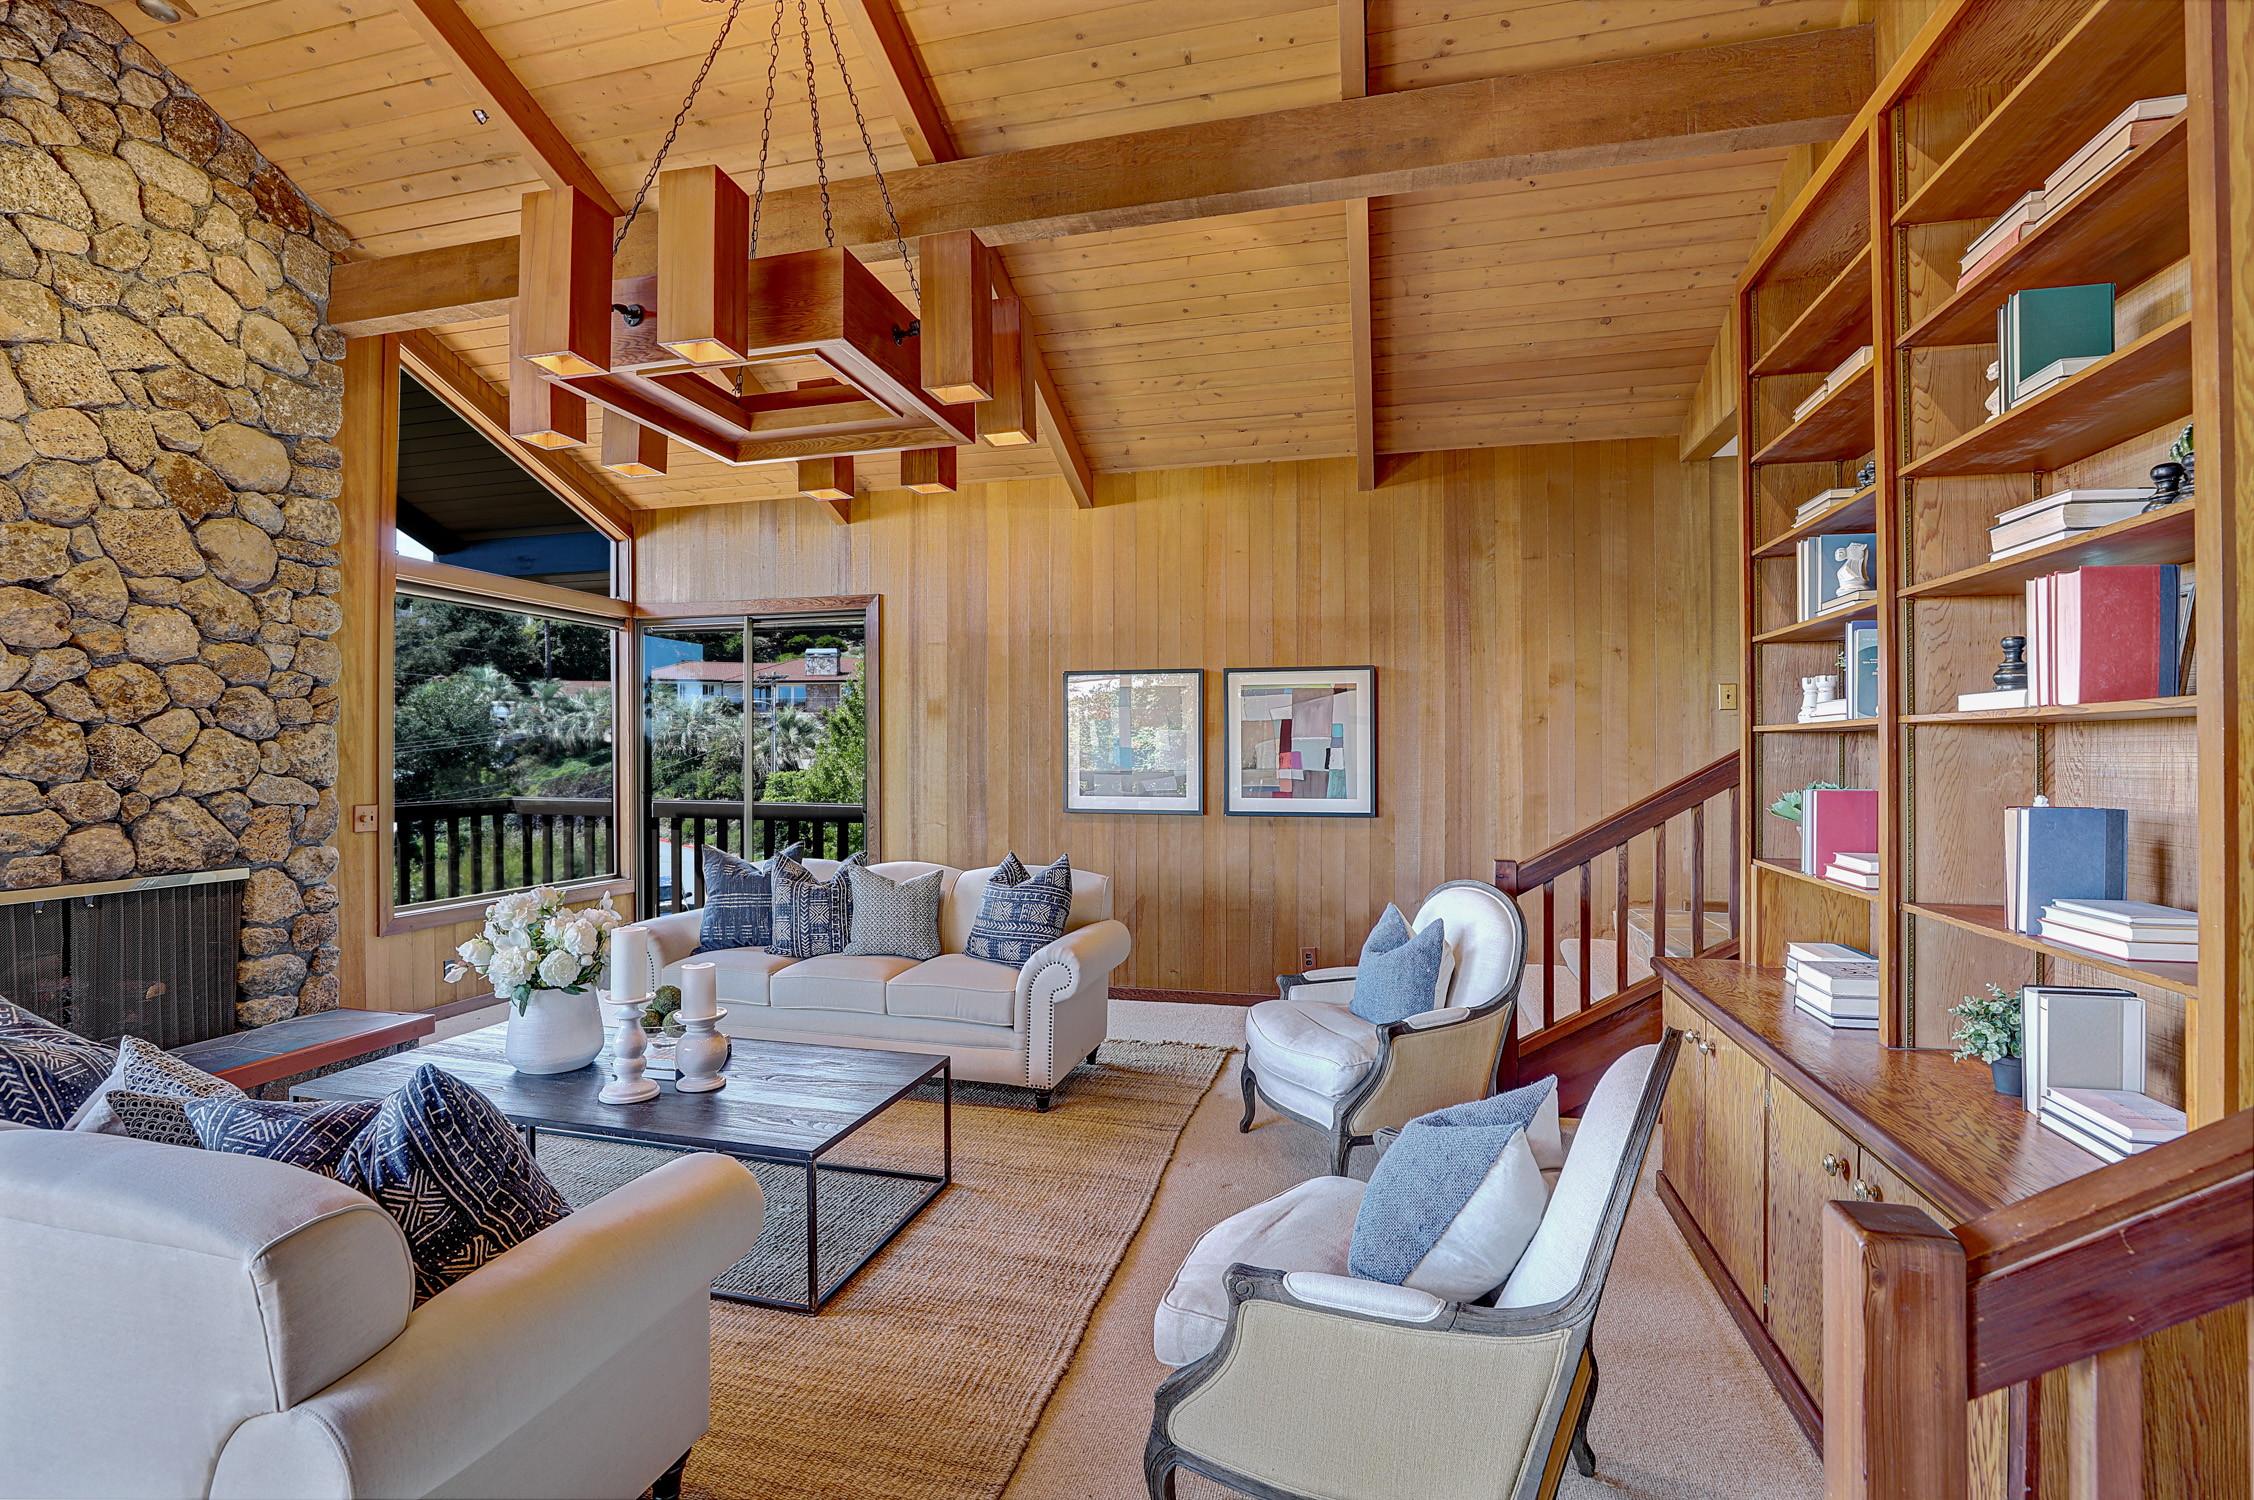 16Dorian 12 MLSSan Rafael Real Estate - Listed by Julia Fitzpatrick + Allie Fornesi Team Own Marin County .jpg